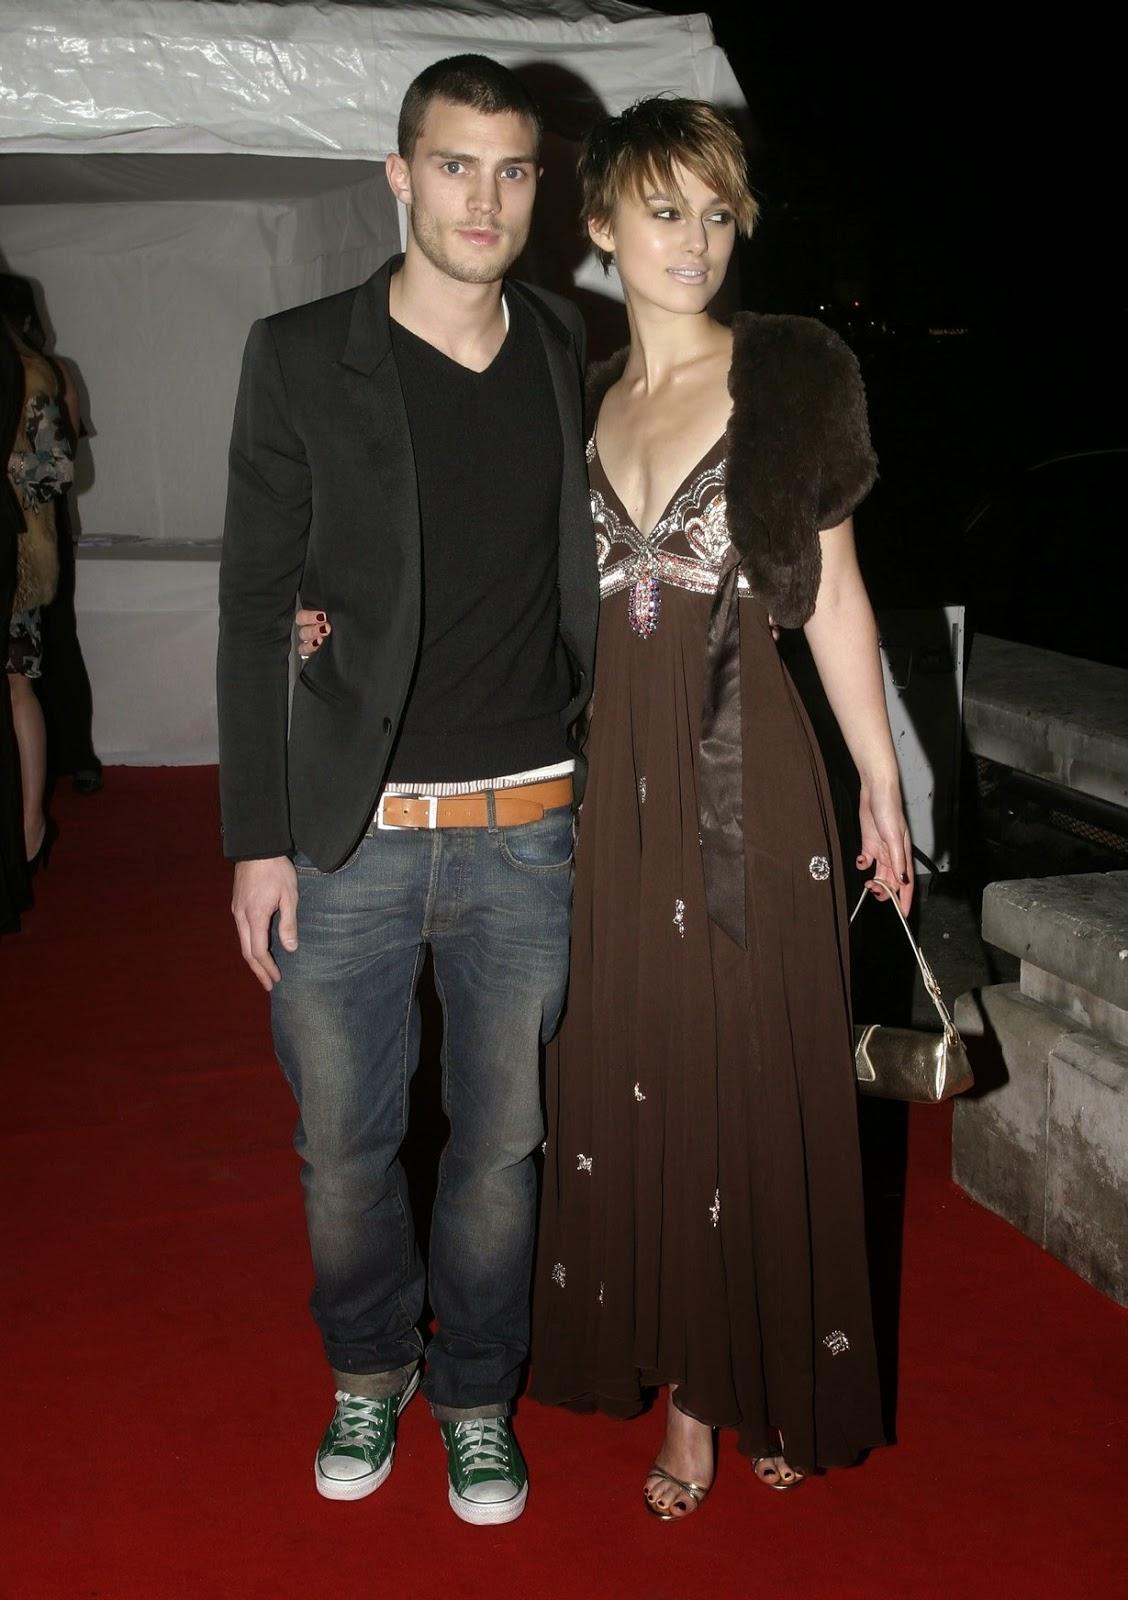 Fotos Ineditas! Jamie Dornan & Keira Knightley en Old Billingsgate Market en Londres- Feb 16- 2005